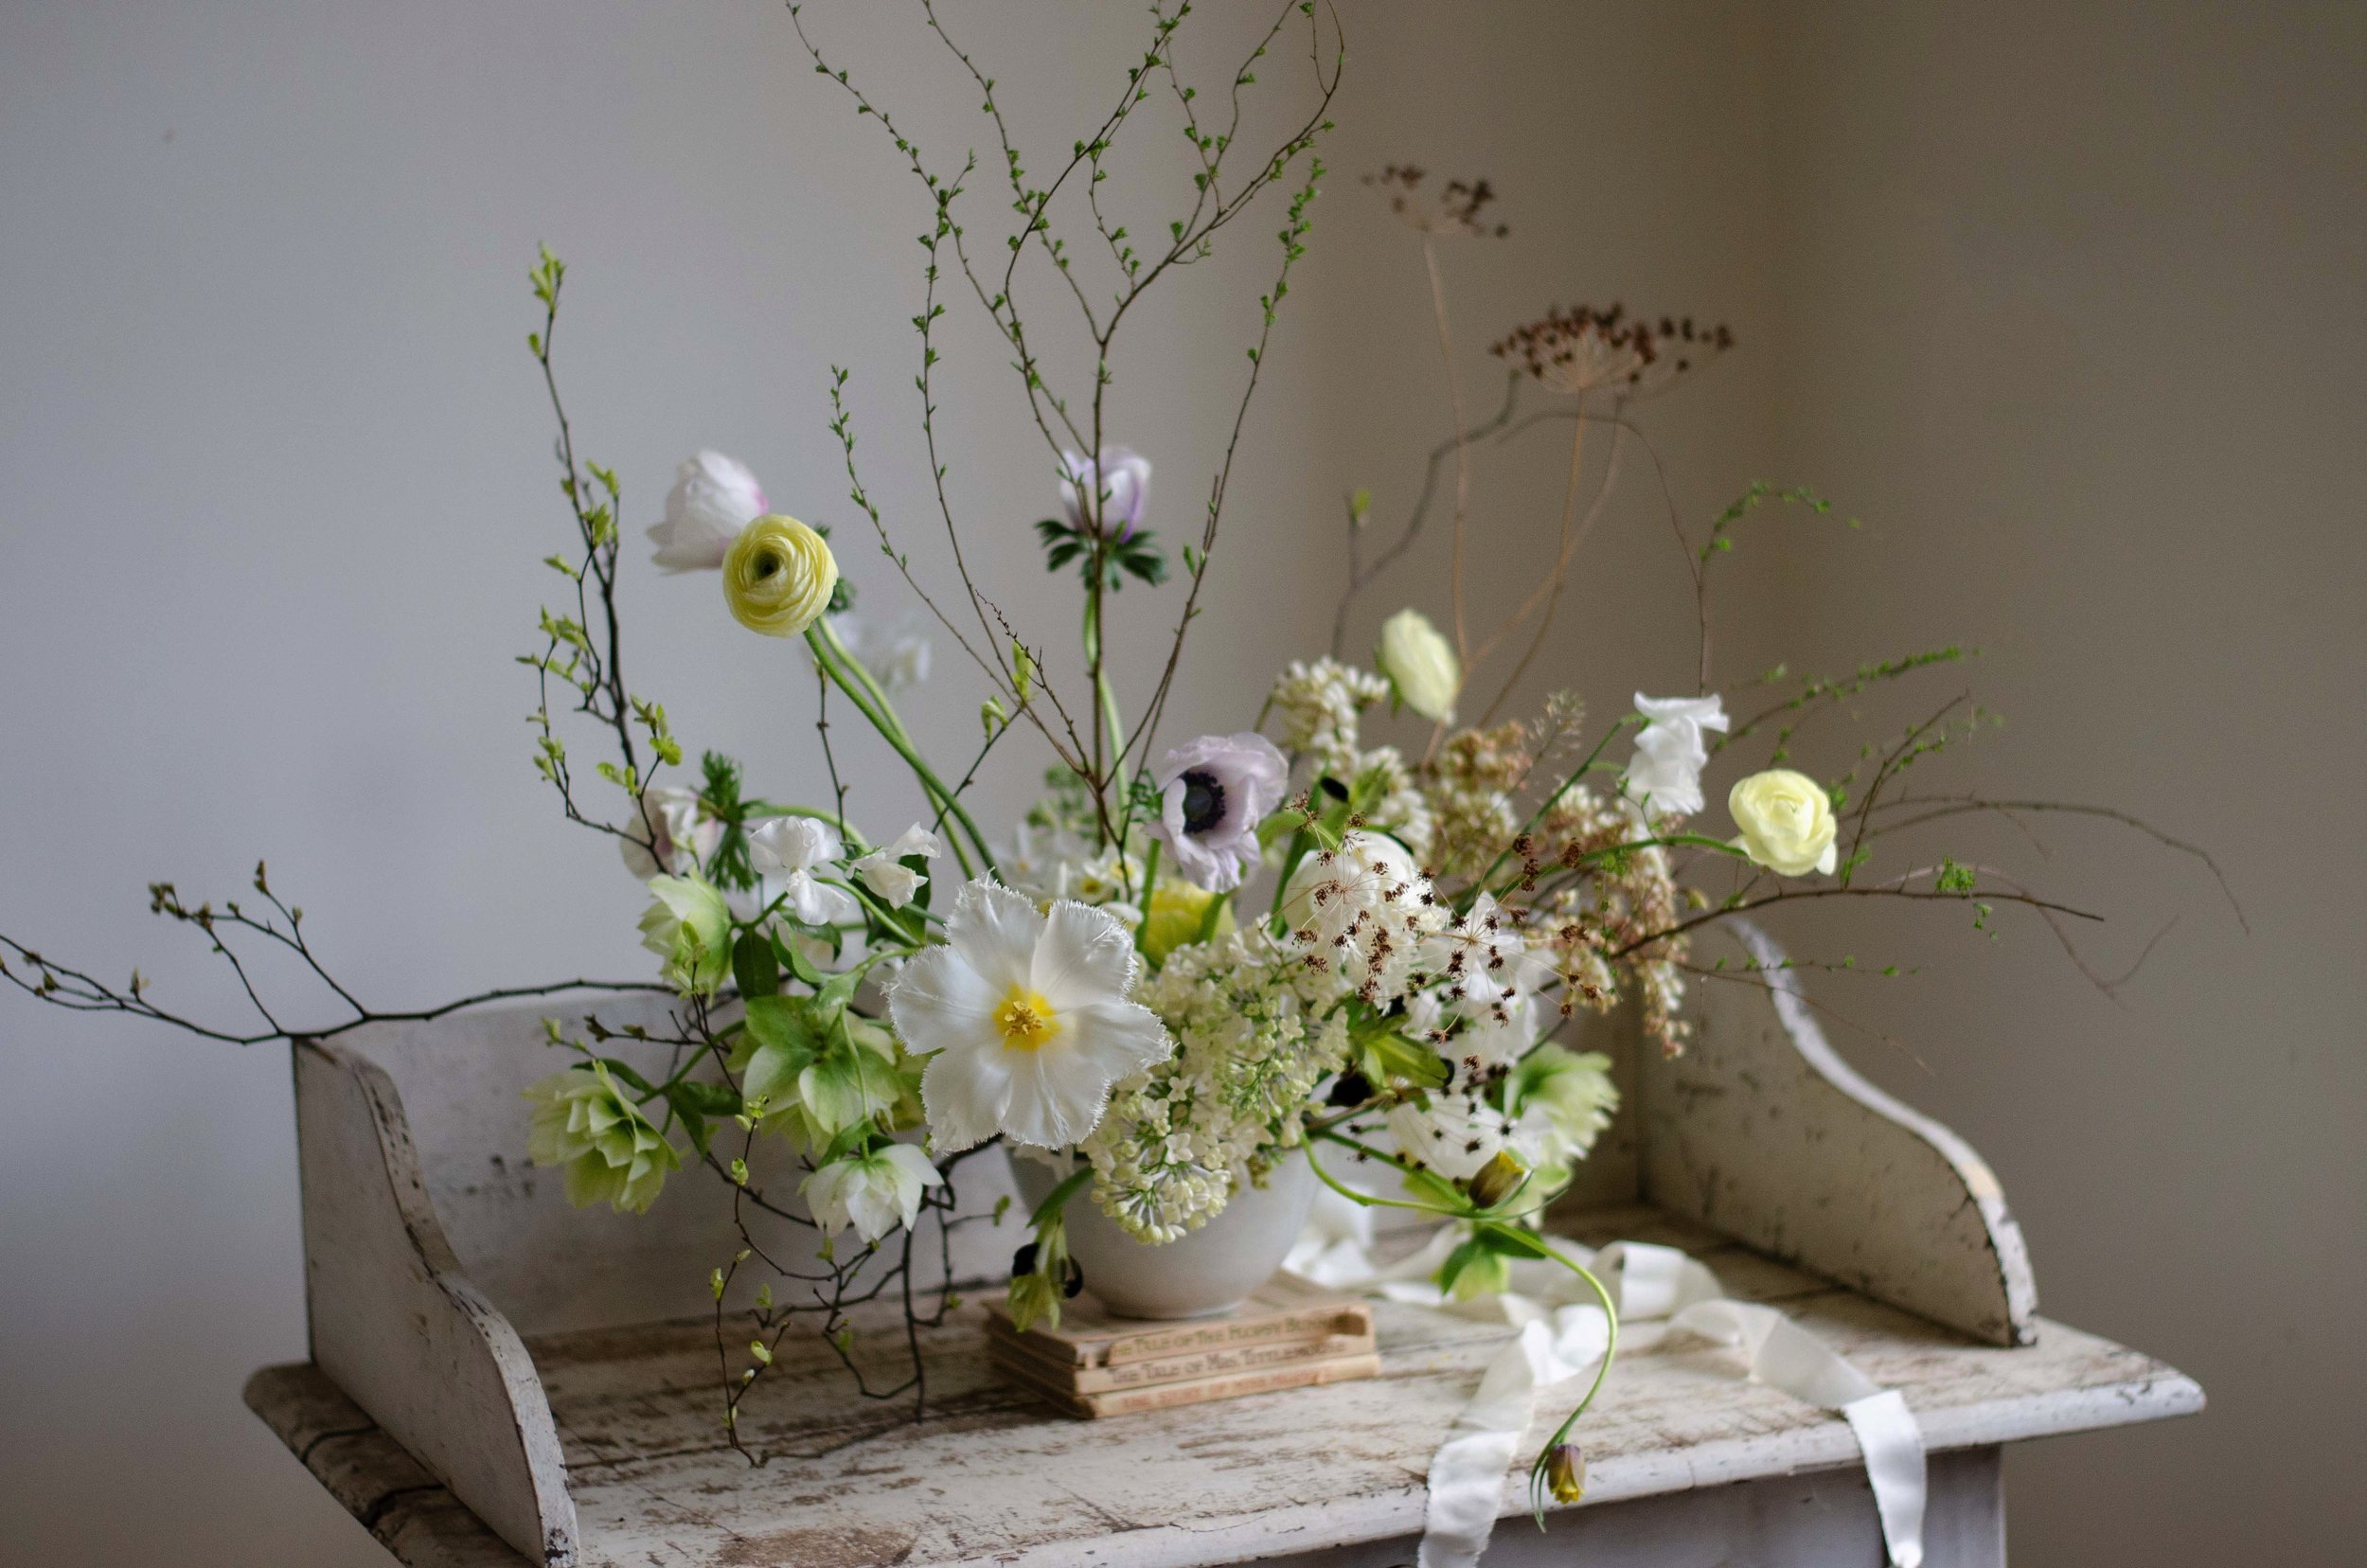 Jo's beautiful arrangement